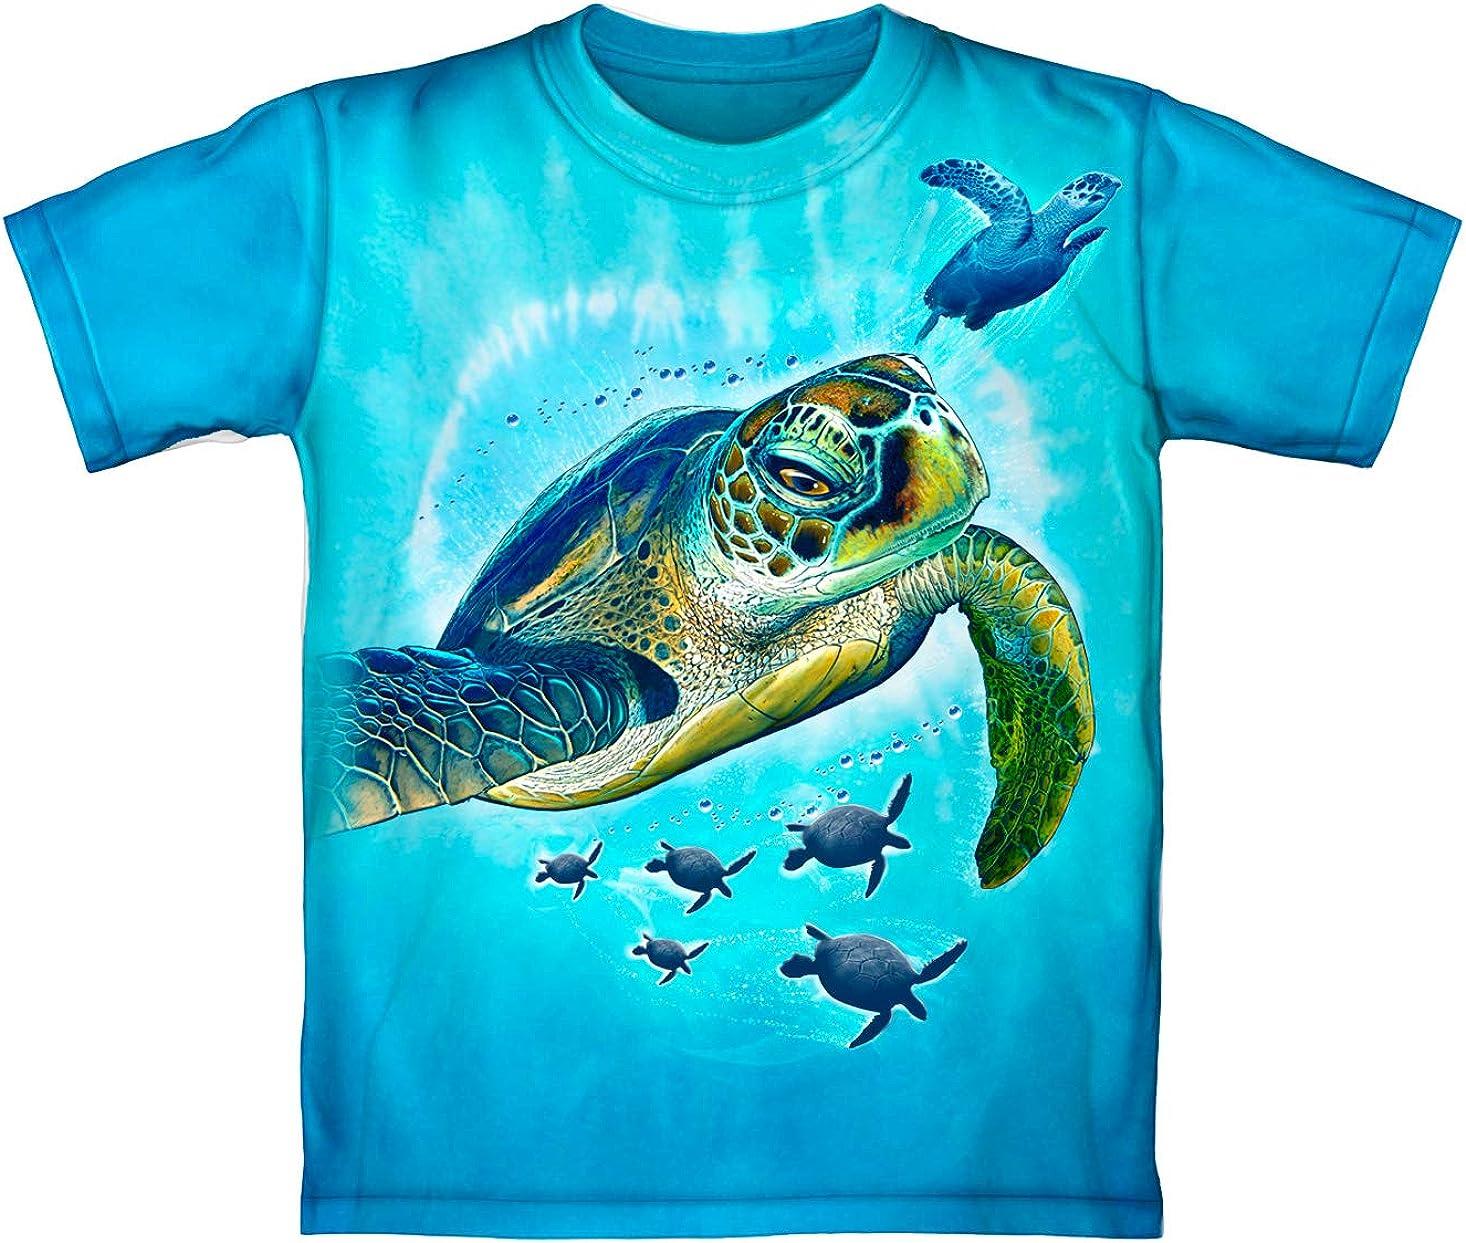 Sea Turtles Tie-Dye Youth Tee Shirt